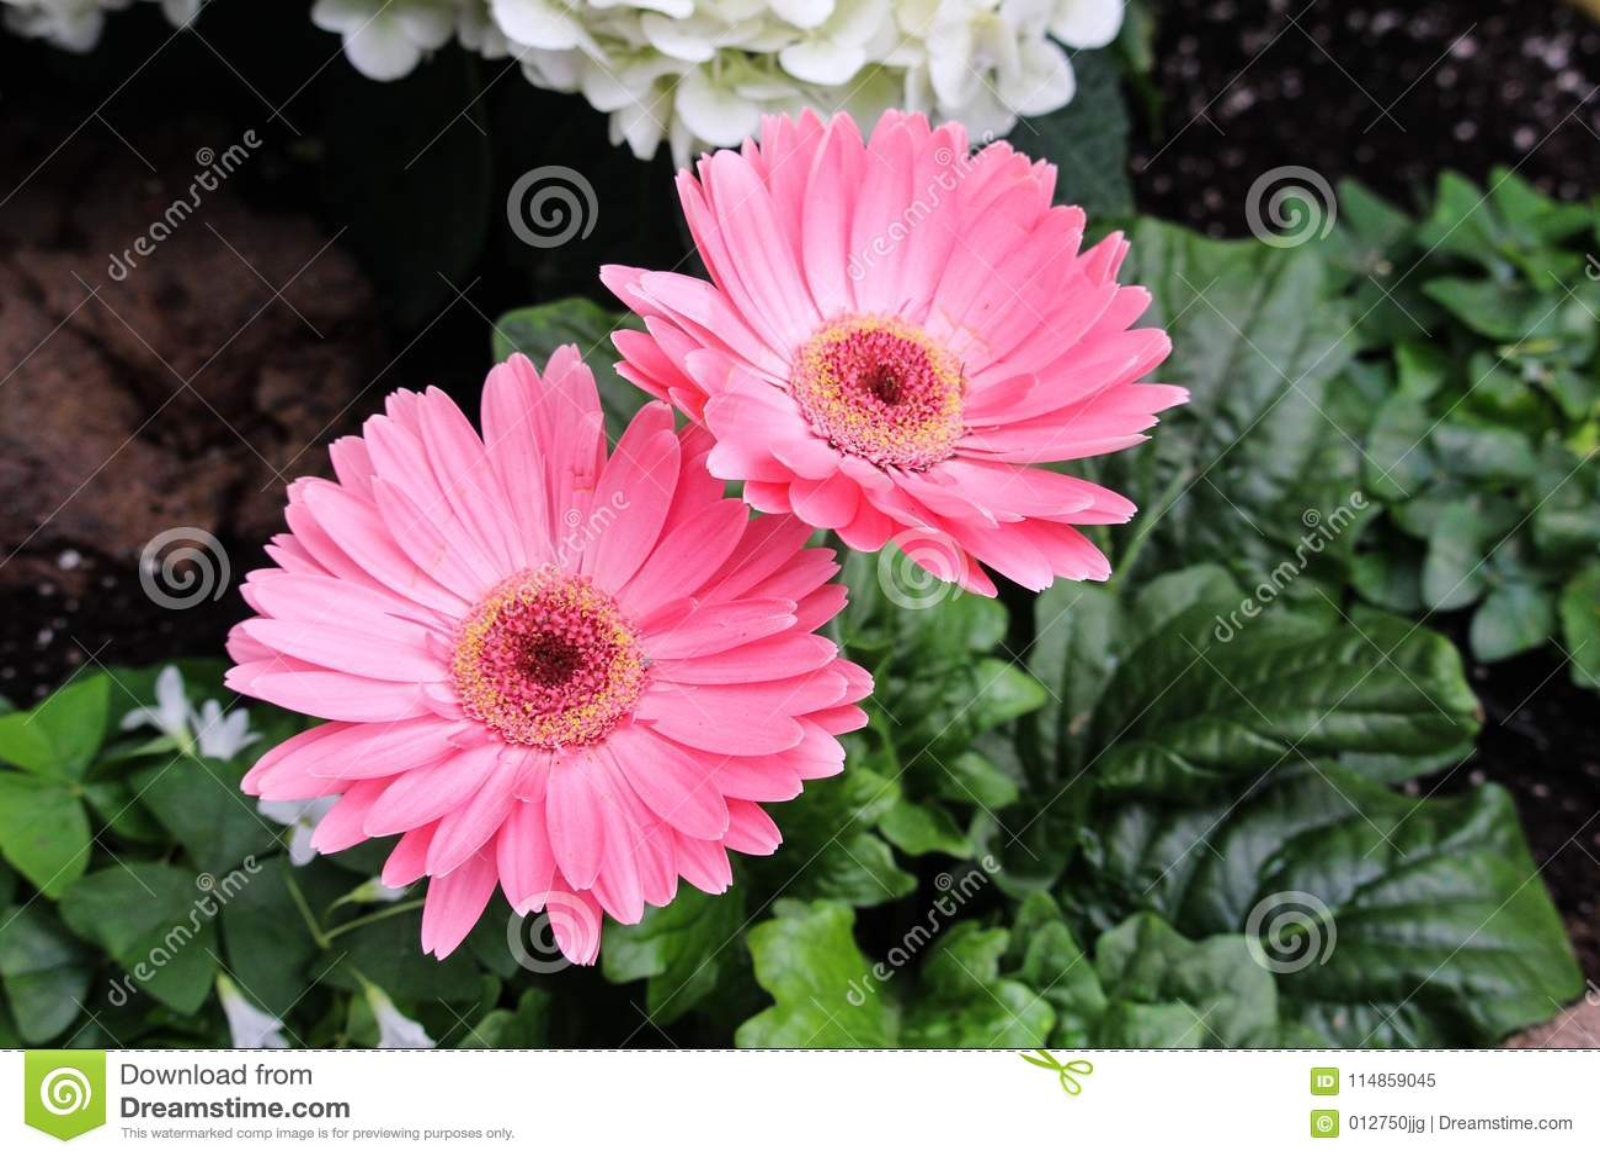 Soft Pink Gerbera Daisies Stock Image Image Of Soft 114859045